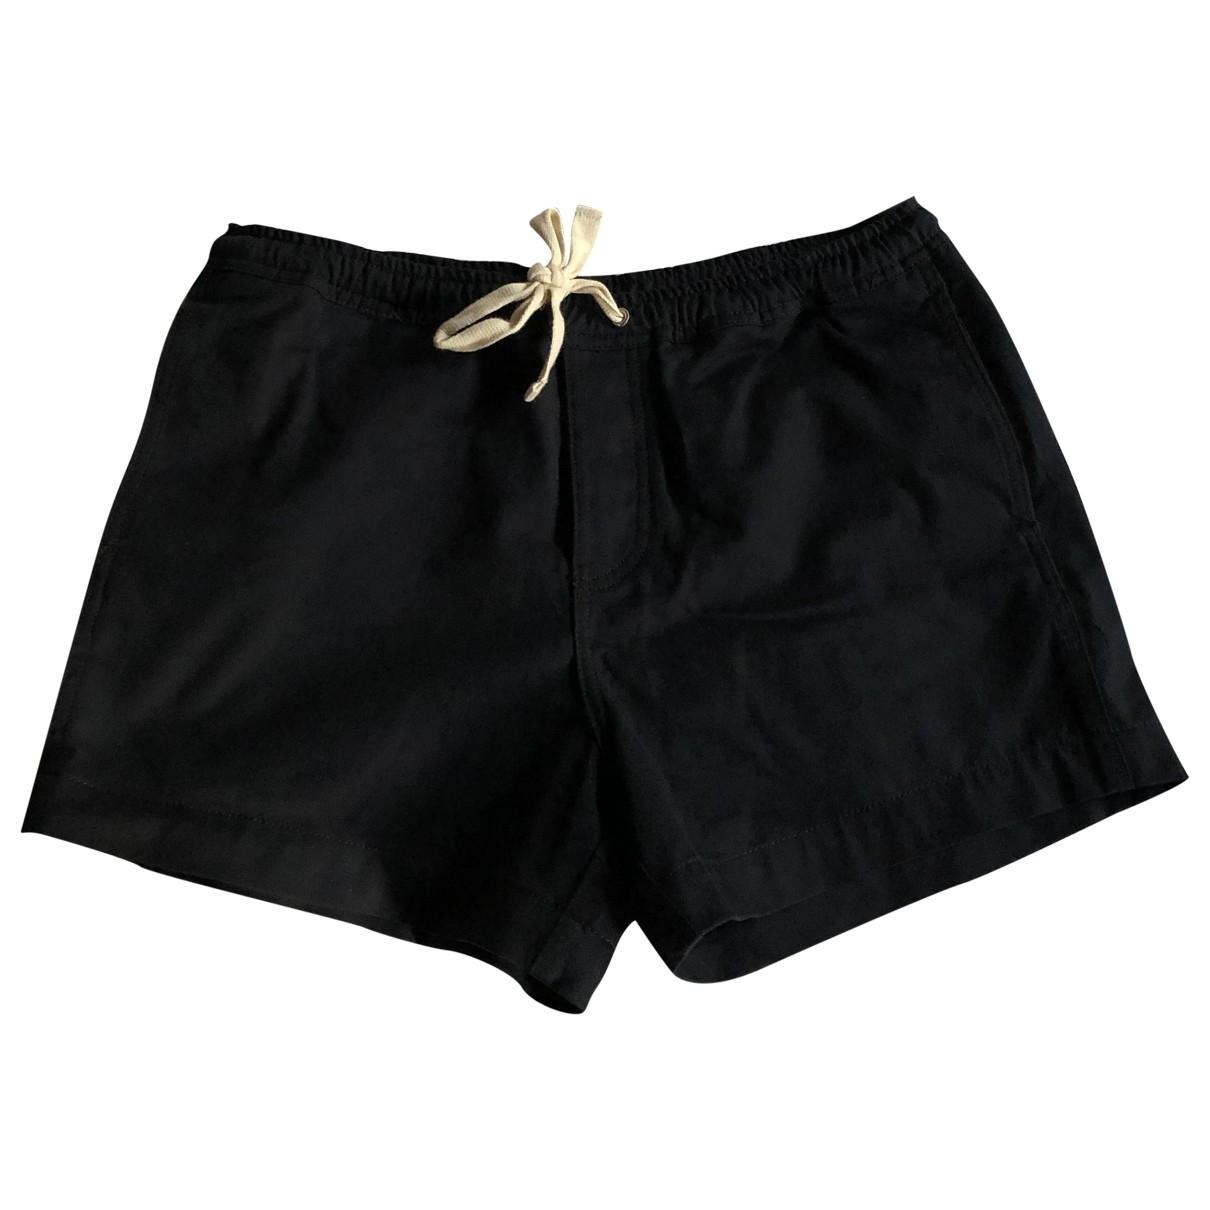 Pantalon corto Spring Summer 2019 The Kooples